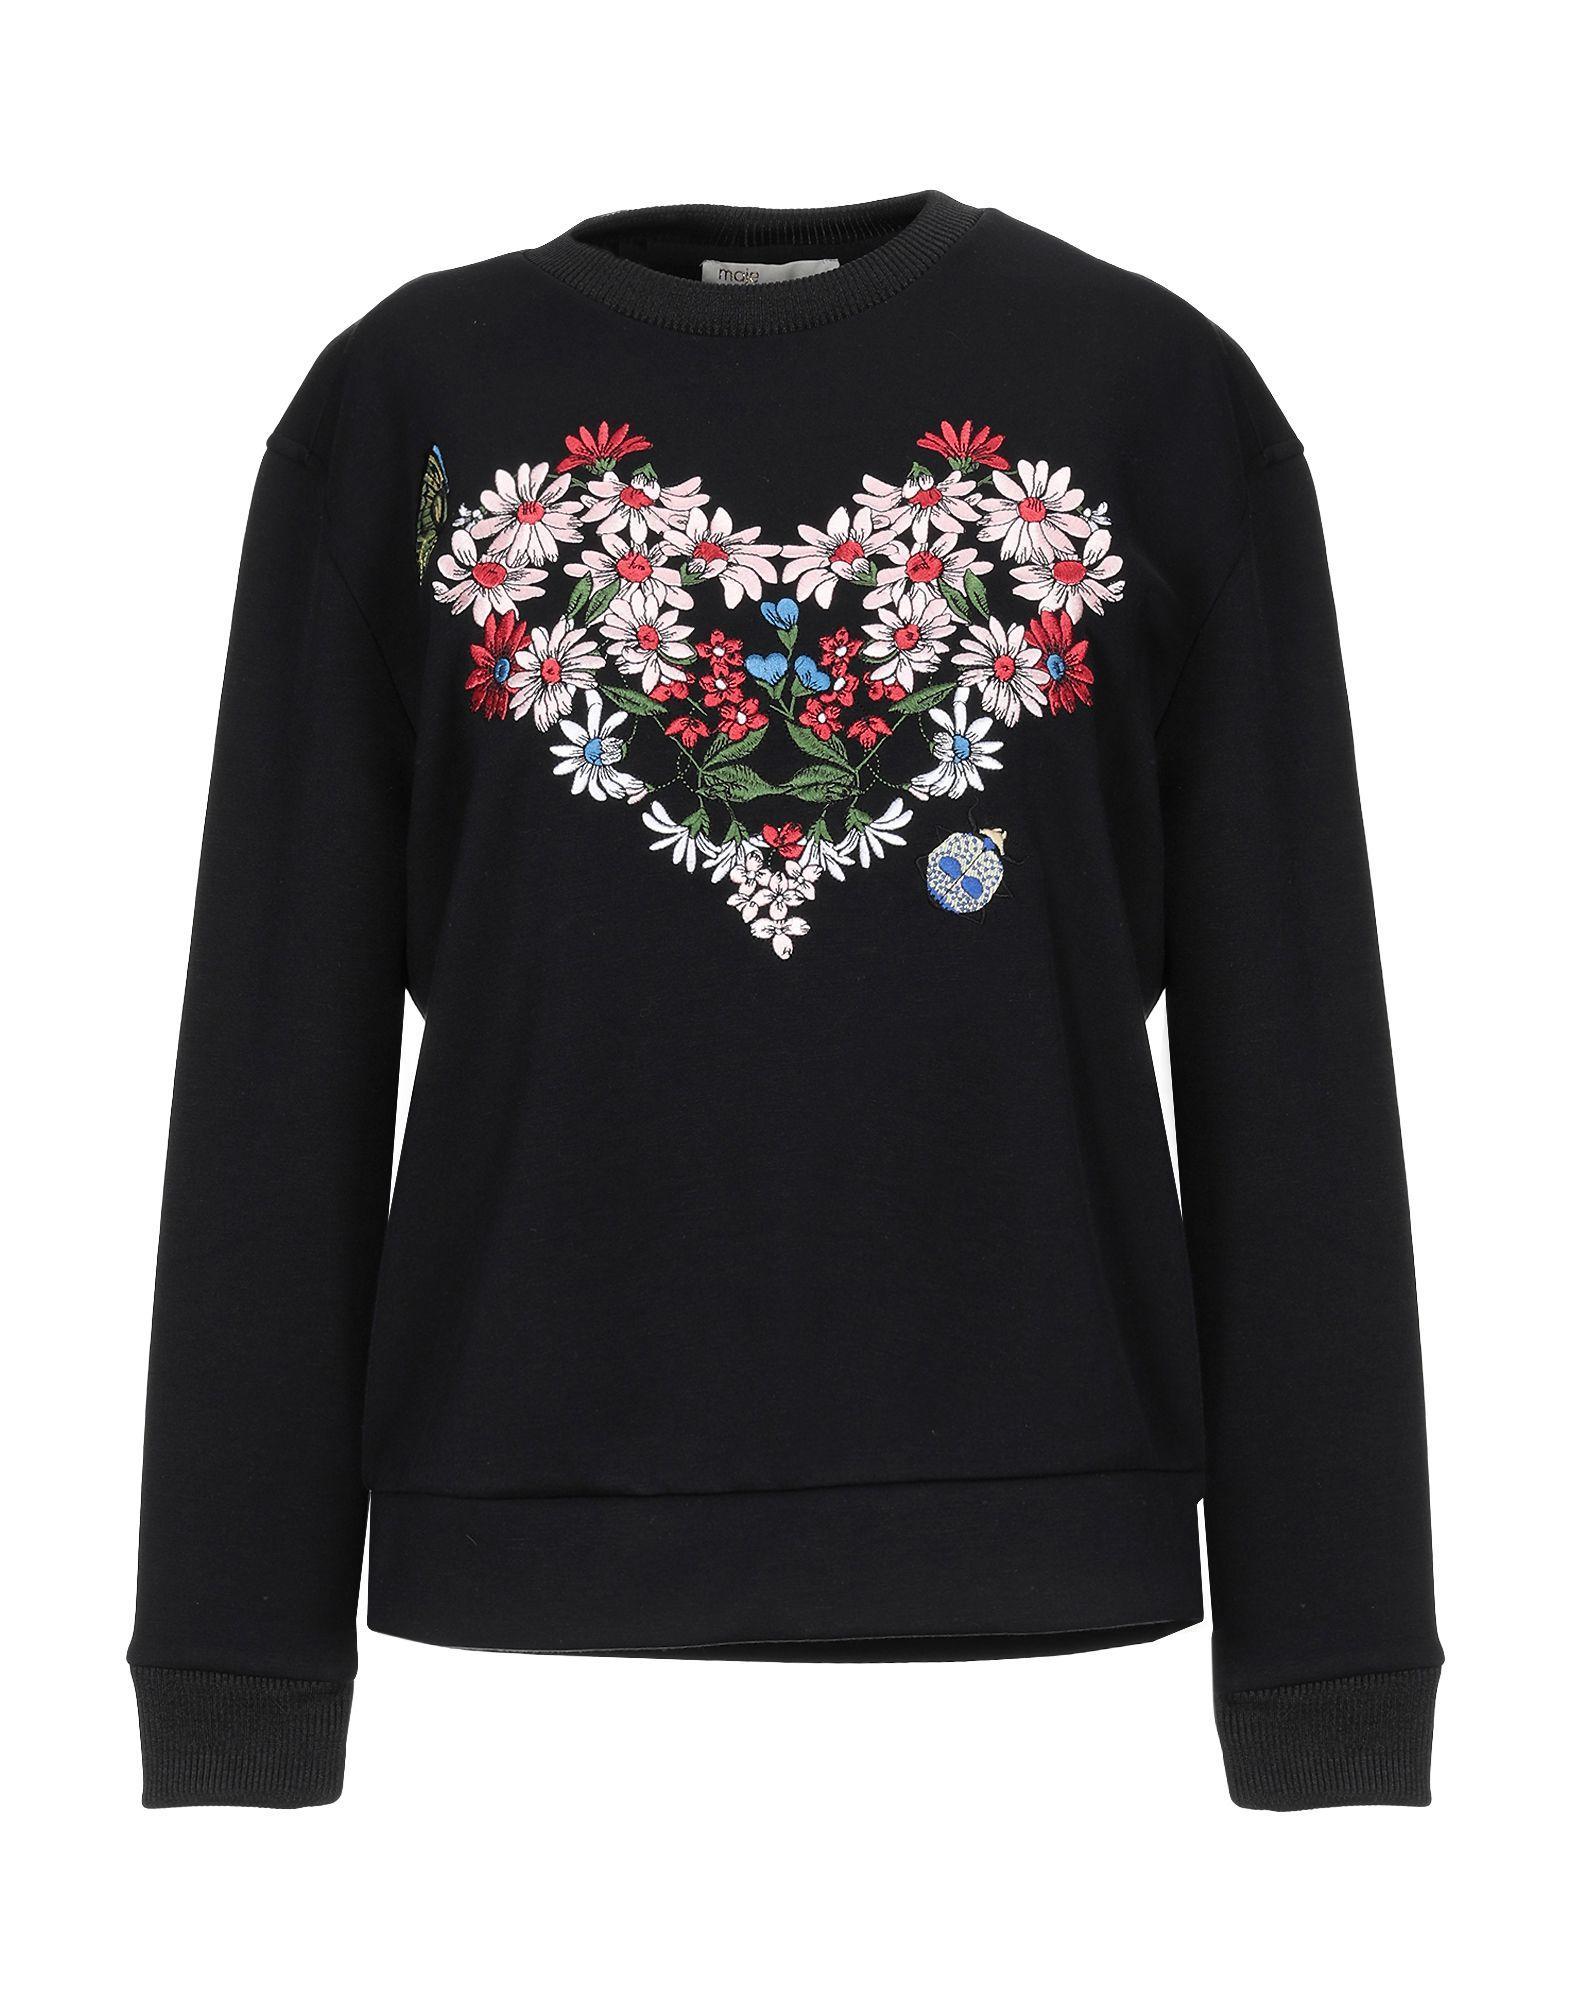 d0620369b6 Lyst - Maje Sweatshirt in Black - Save 25%